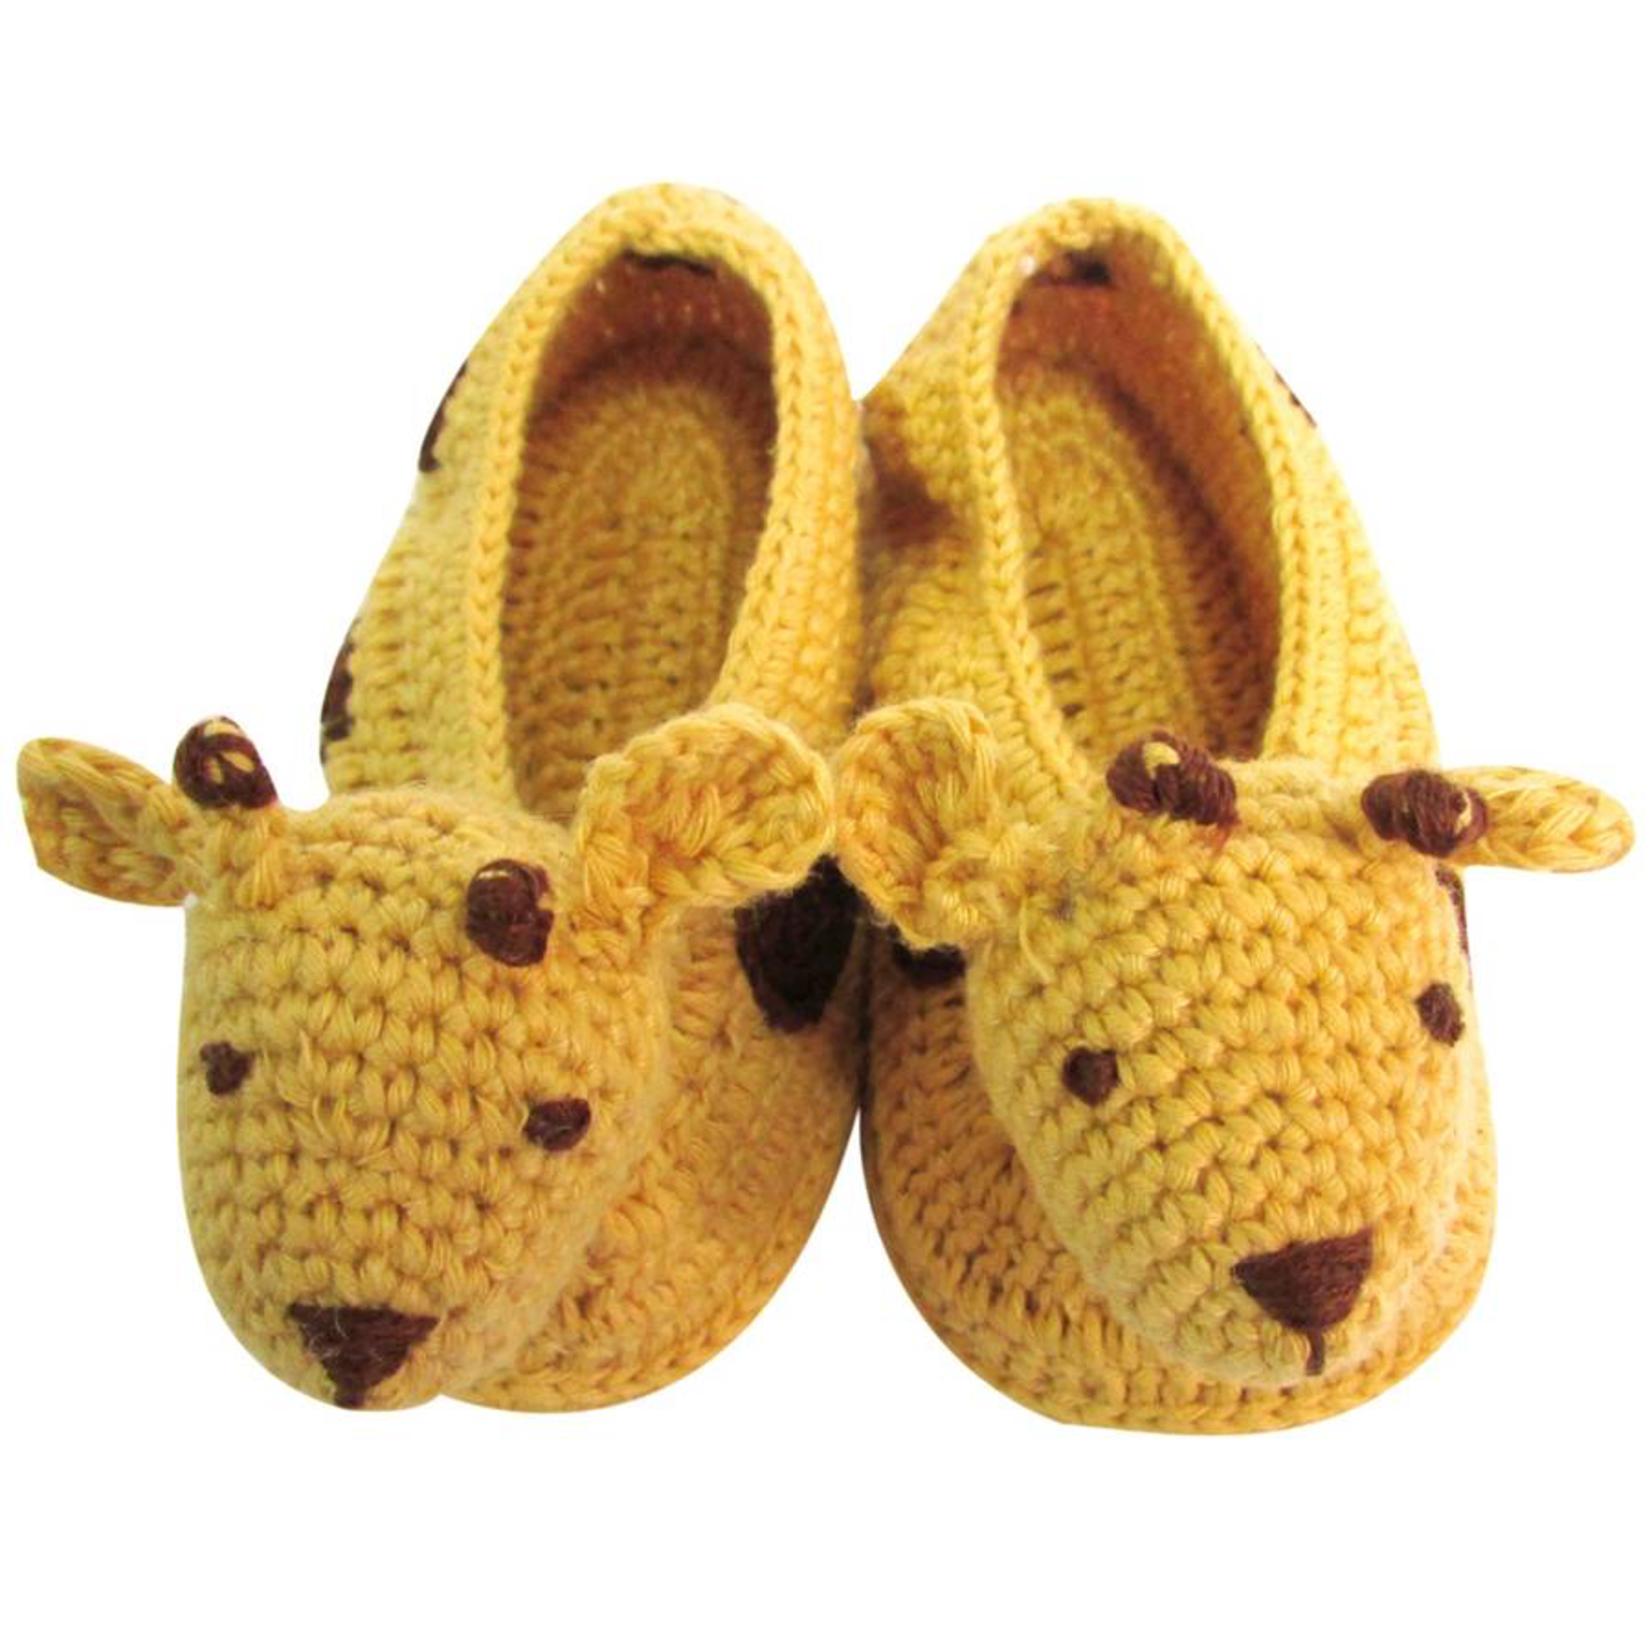 Albetta Albetta Crochet Giraffe Booties Brown